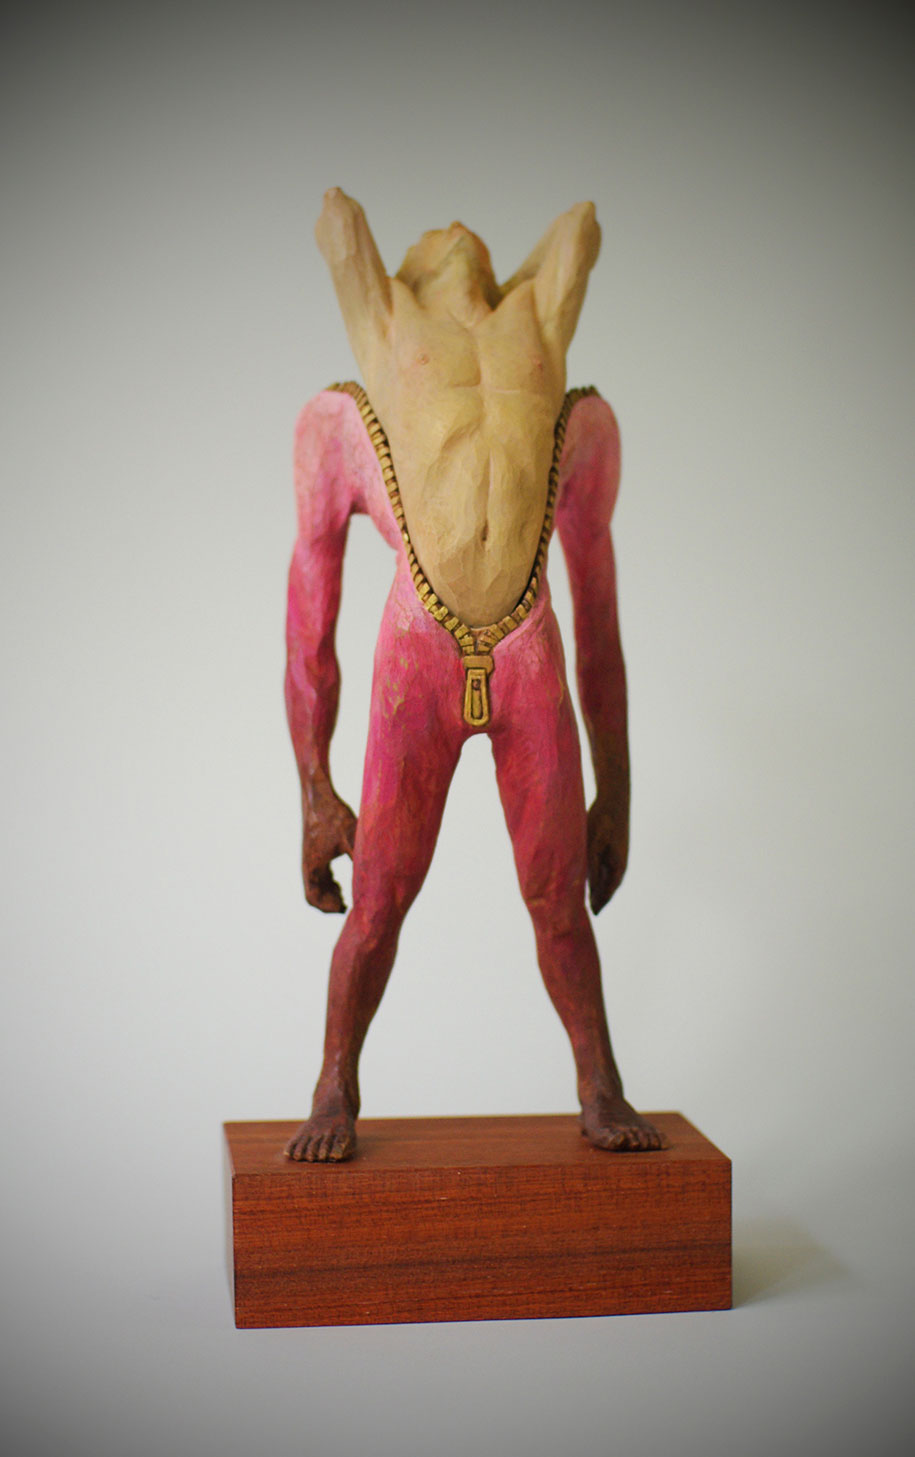 surreal-wooden-sculptures-yoshitoshi-kanemaki-42